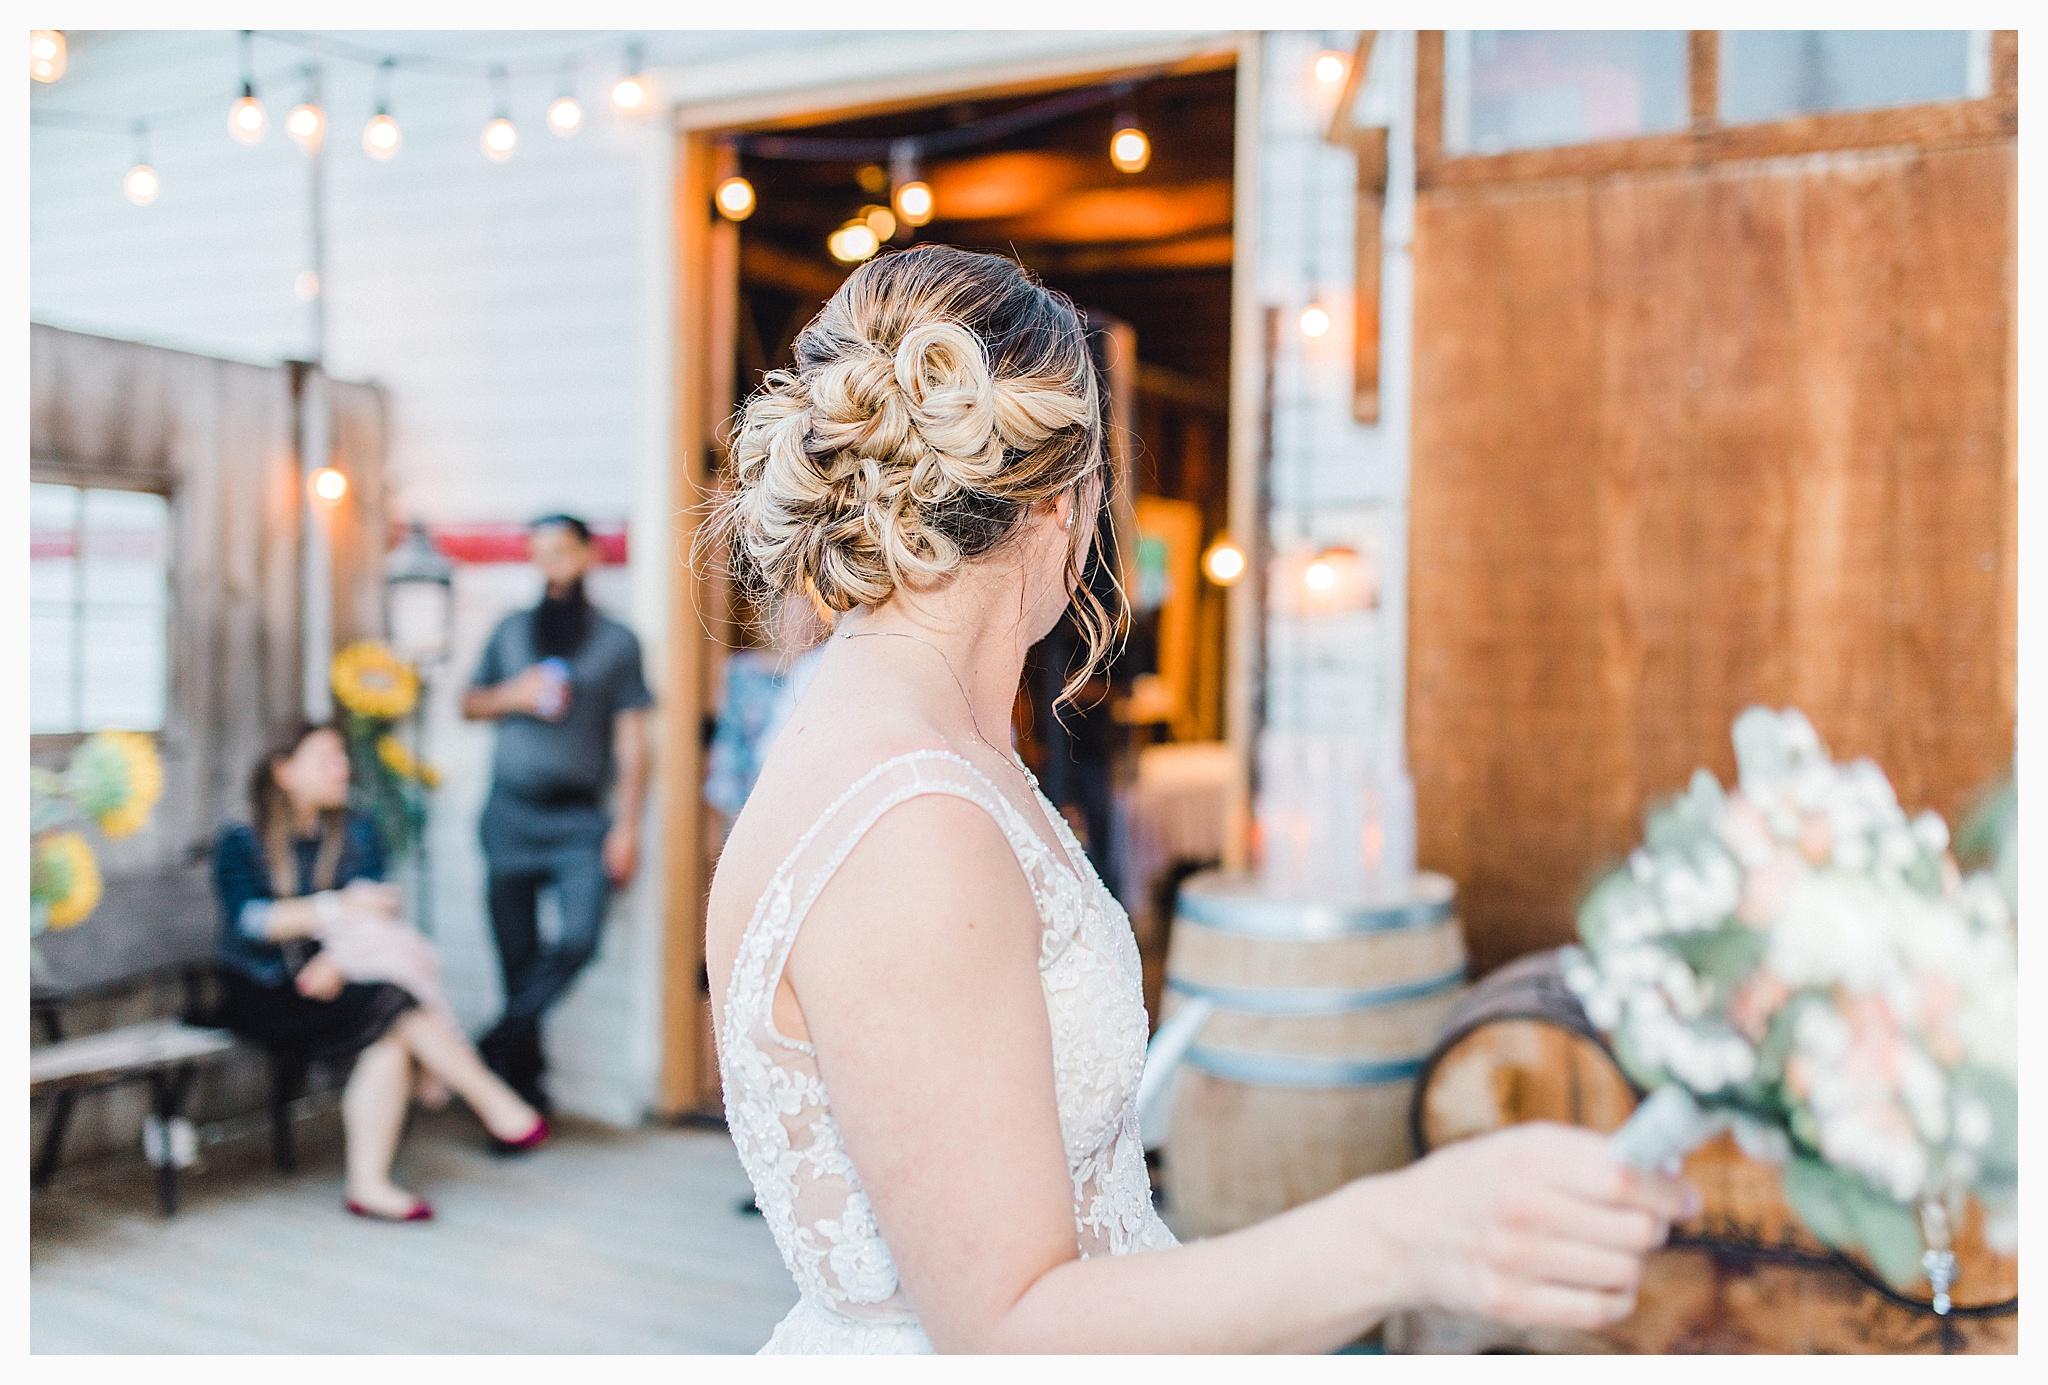 Rustic barn wedding in Wenatchee Washington at Sunshine Ranch on Easy Street, Emma Rose Company Seattle PNW Light and Airy Wedding Photographer_0128.jpg